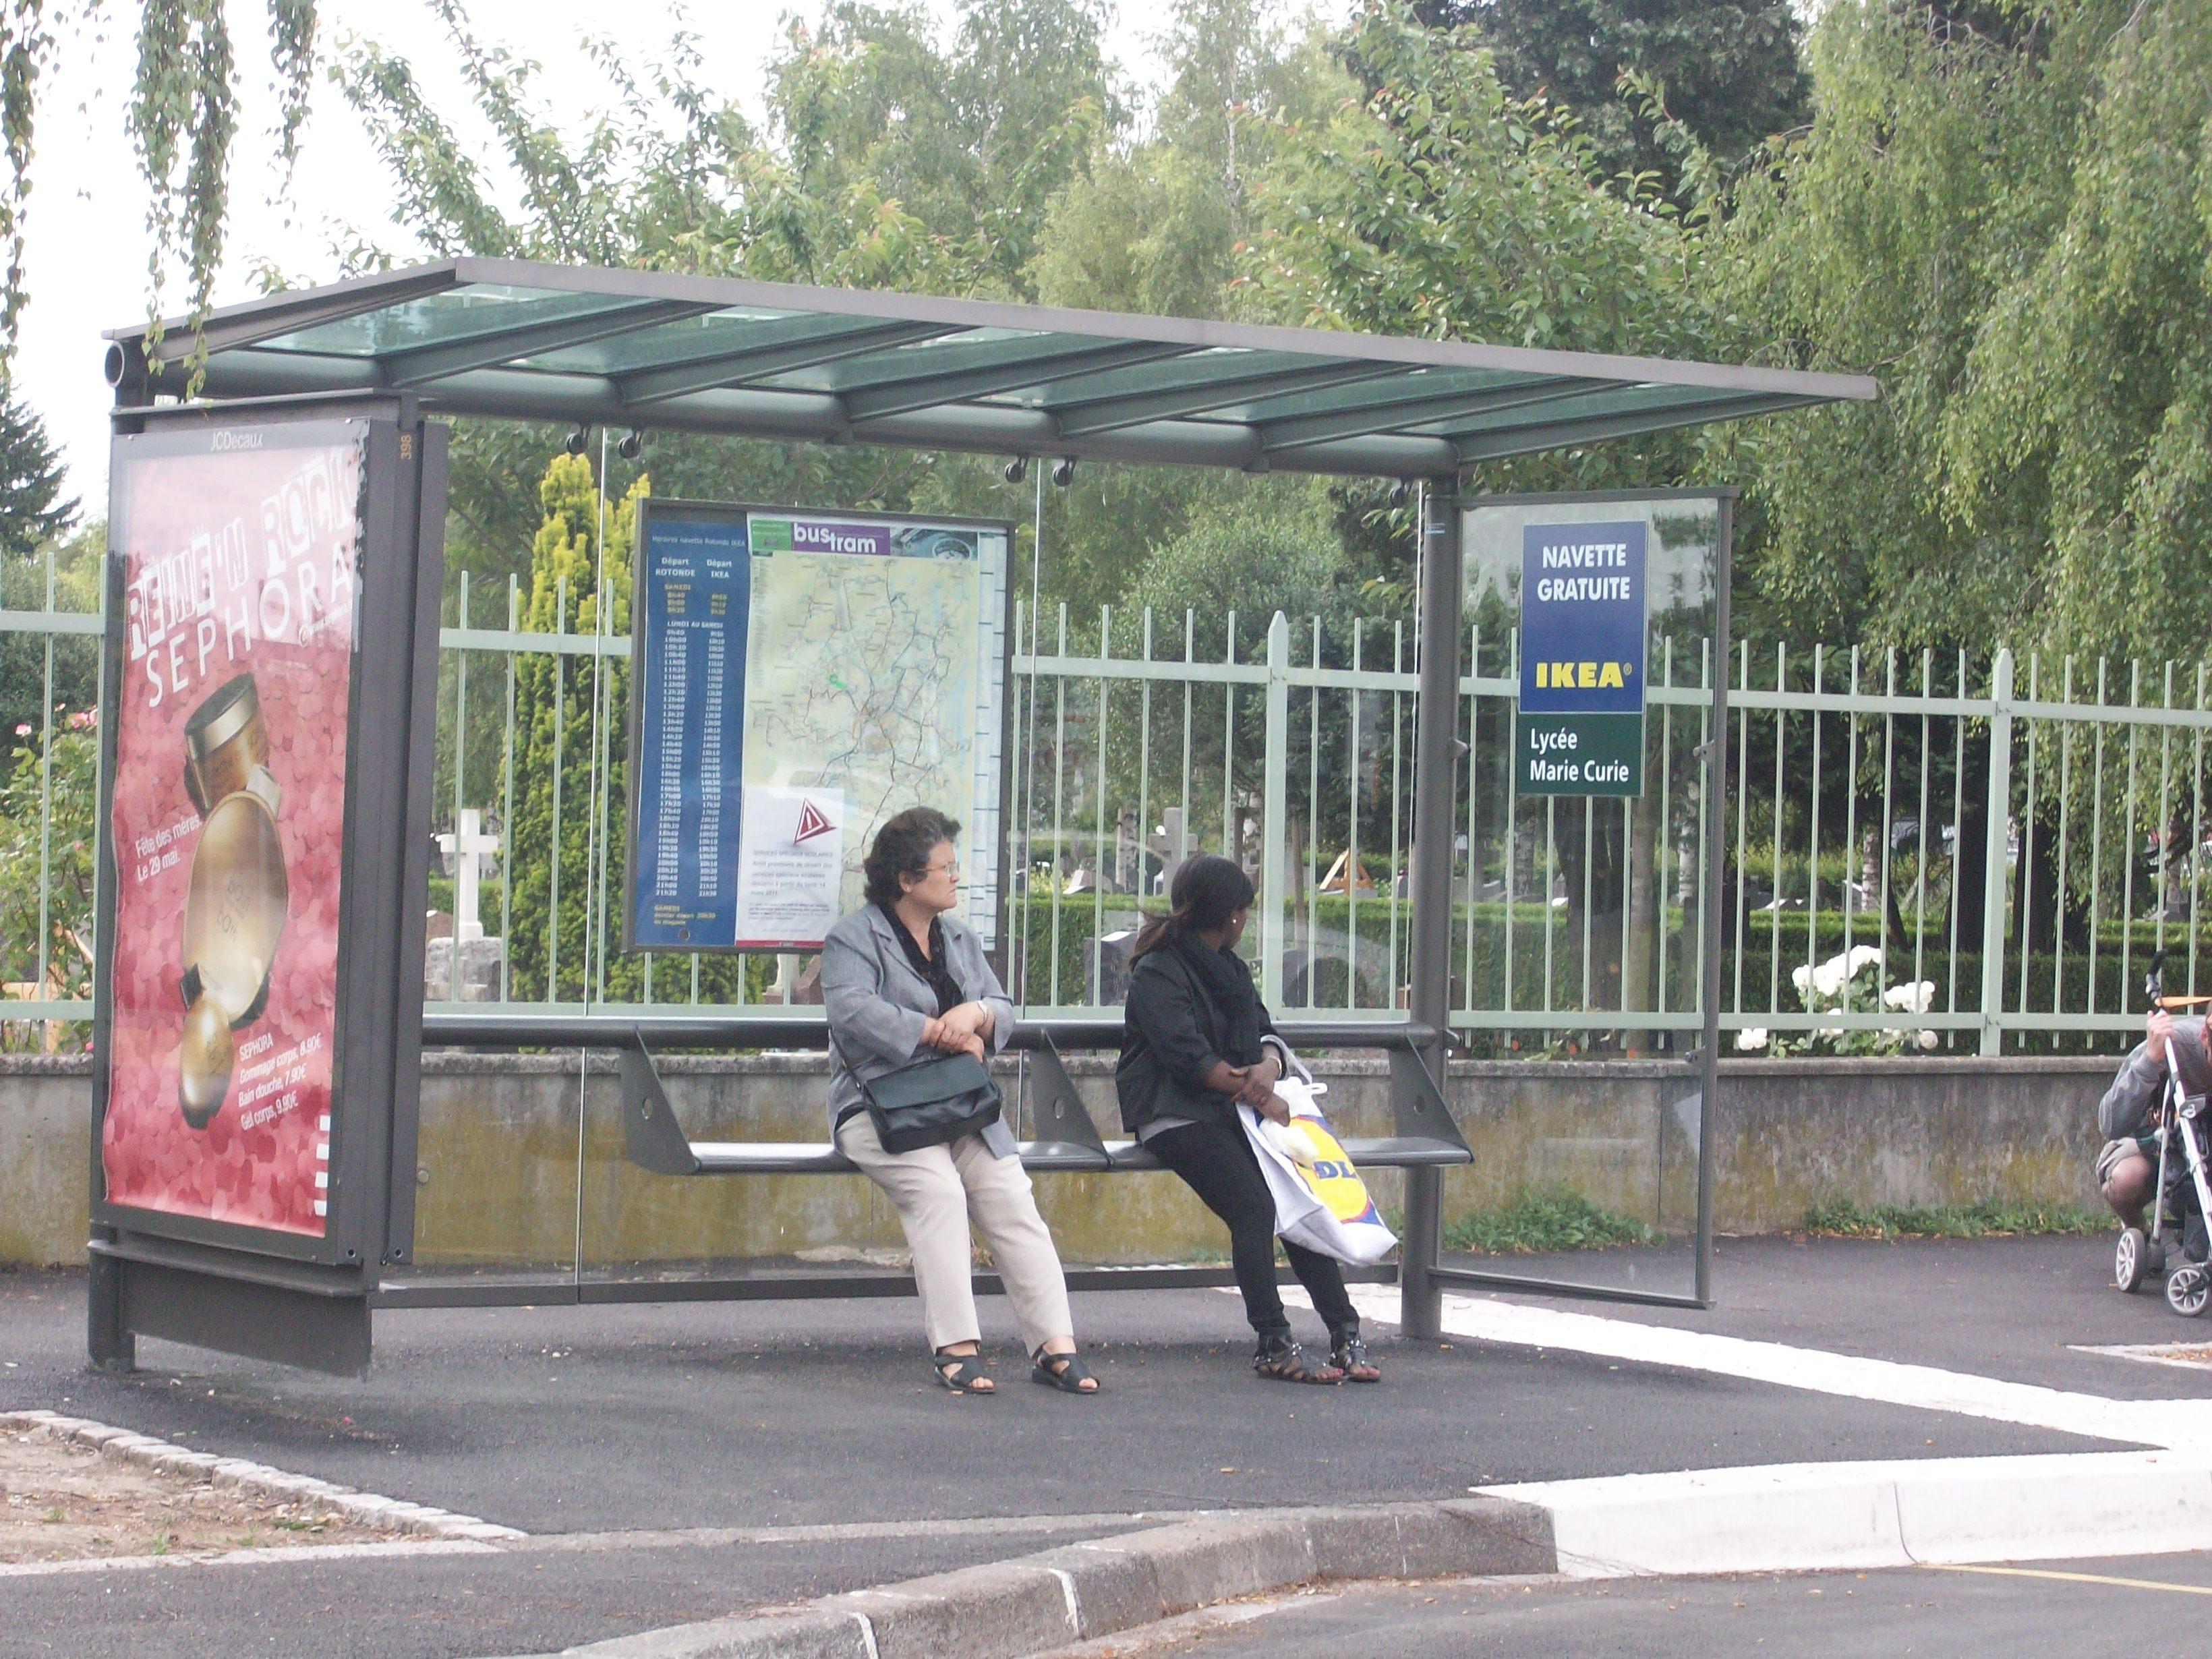 Ikea Strasbourg Sapin pour file:navette ikea strasbourg - arret de bus - wikimedia commons